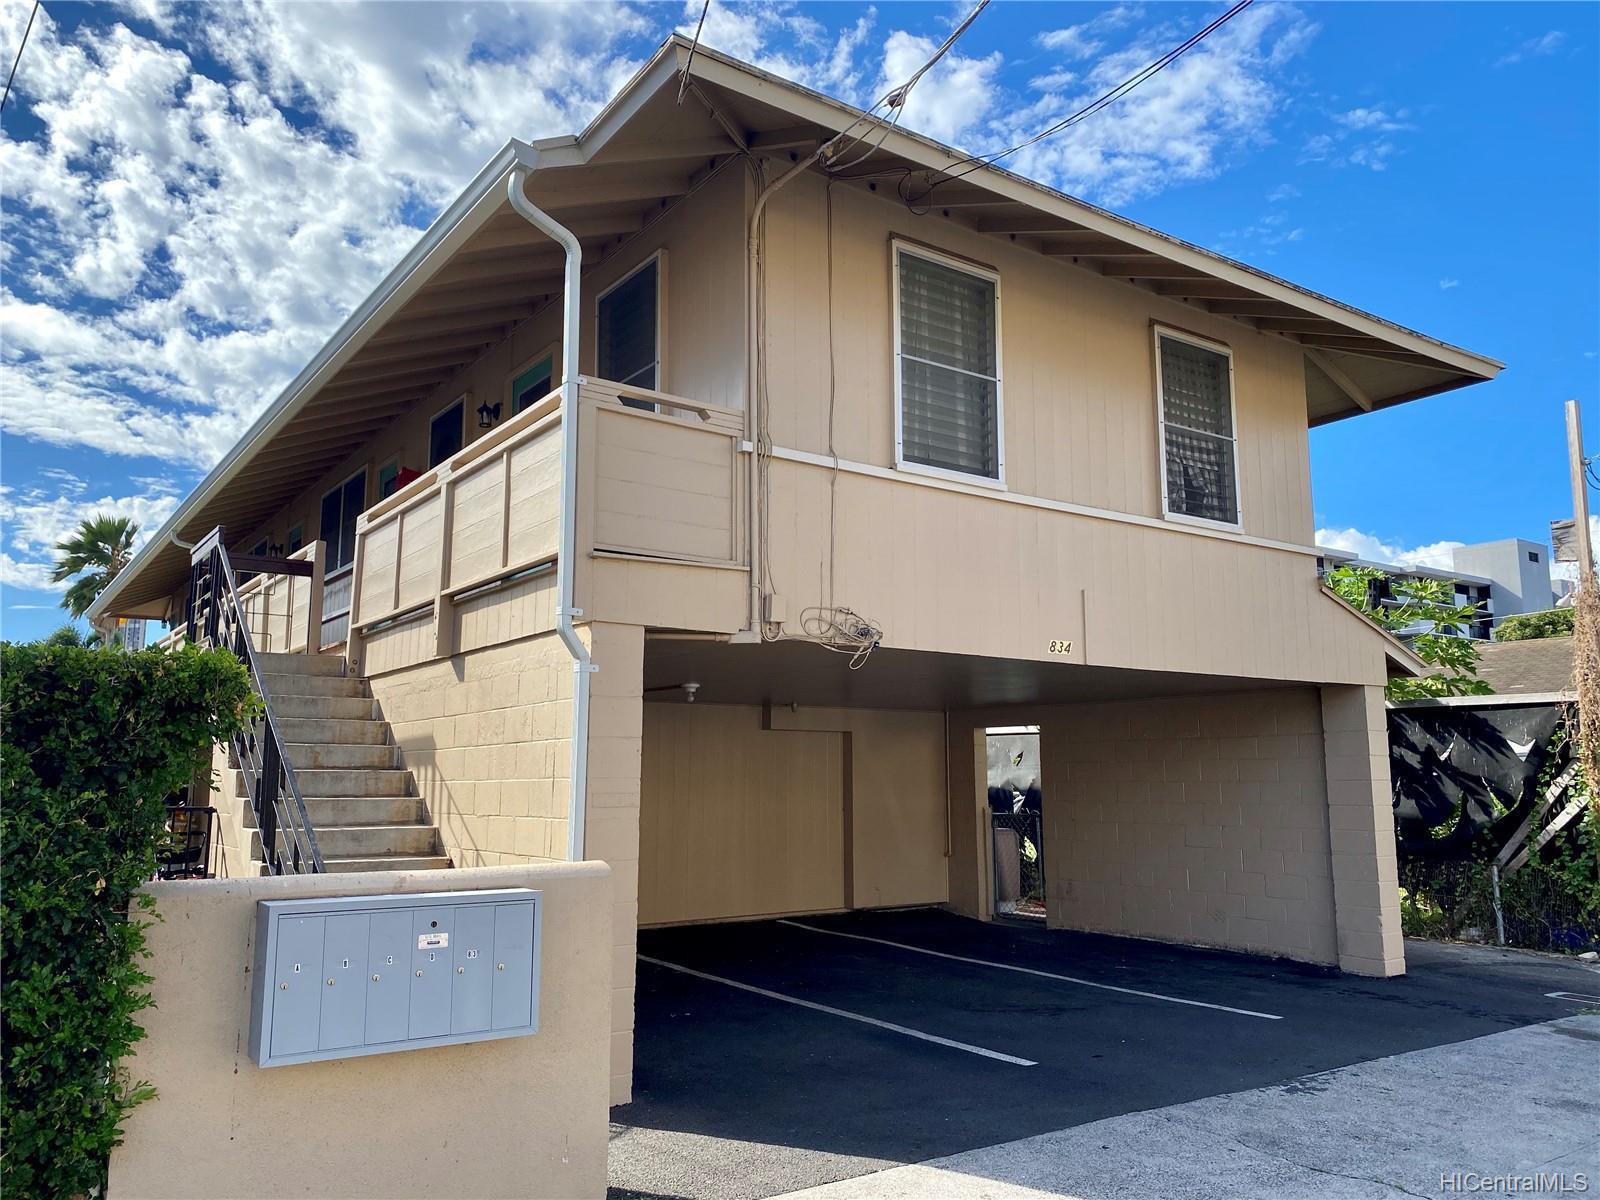 834 Pumehana Street Honolulu - Multi-family - photo 1 of 8